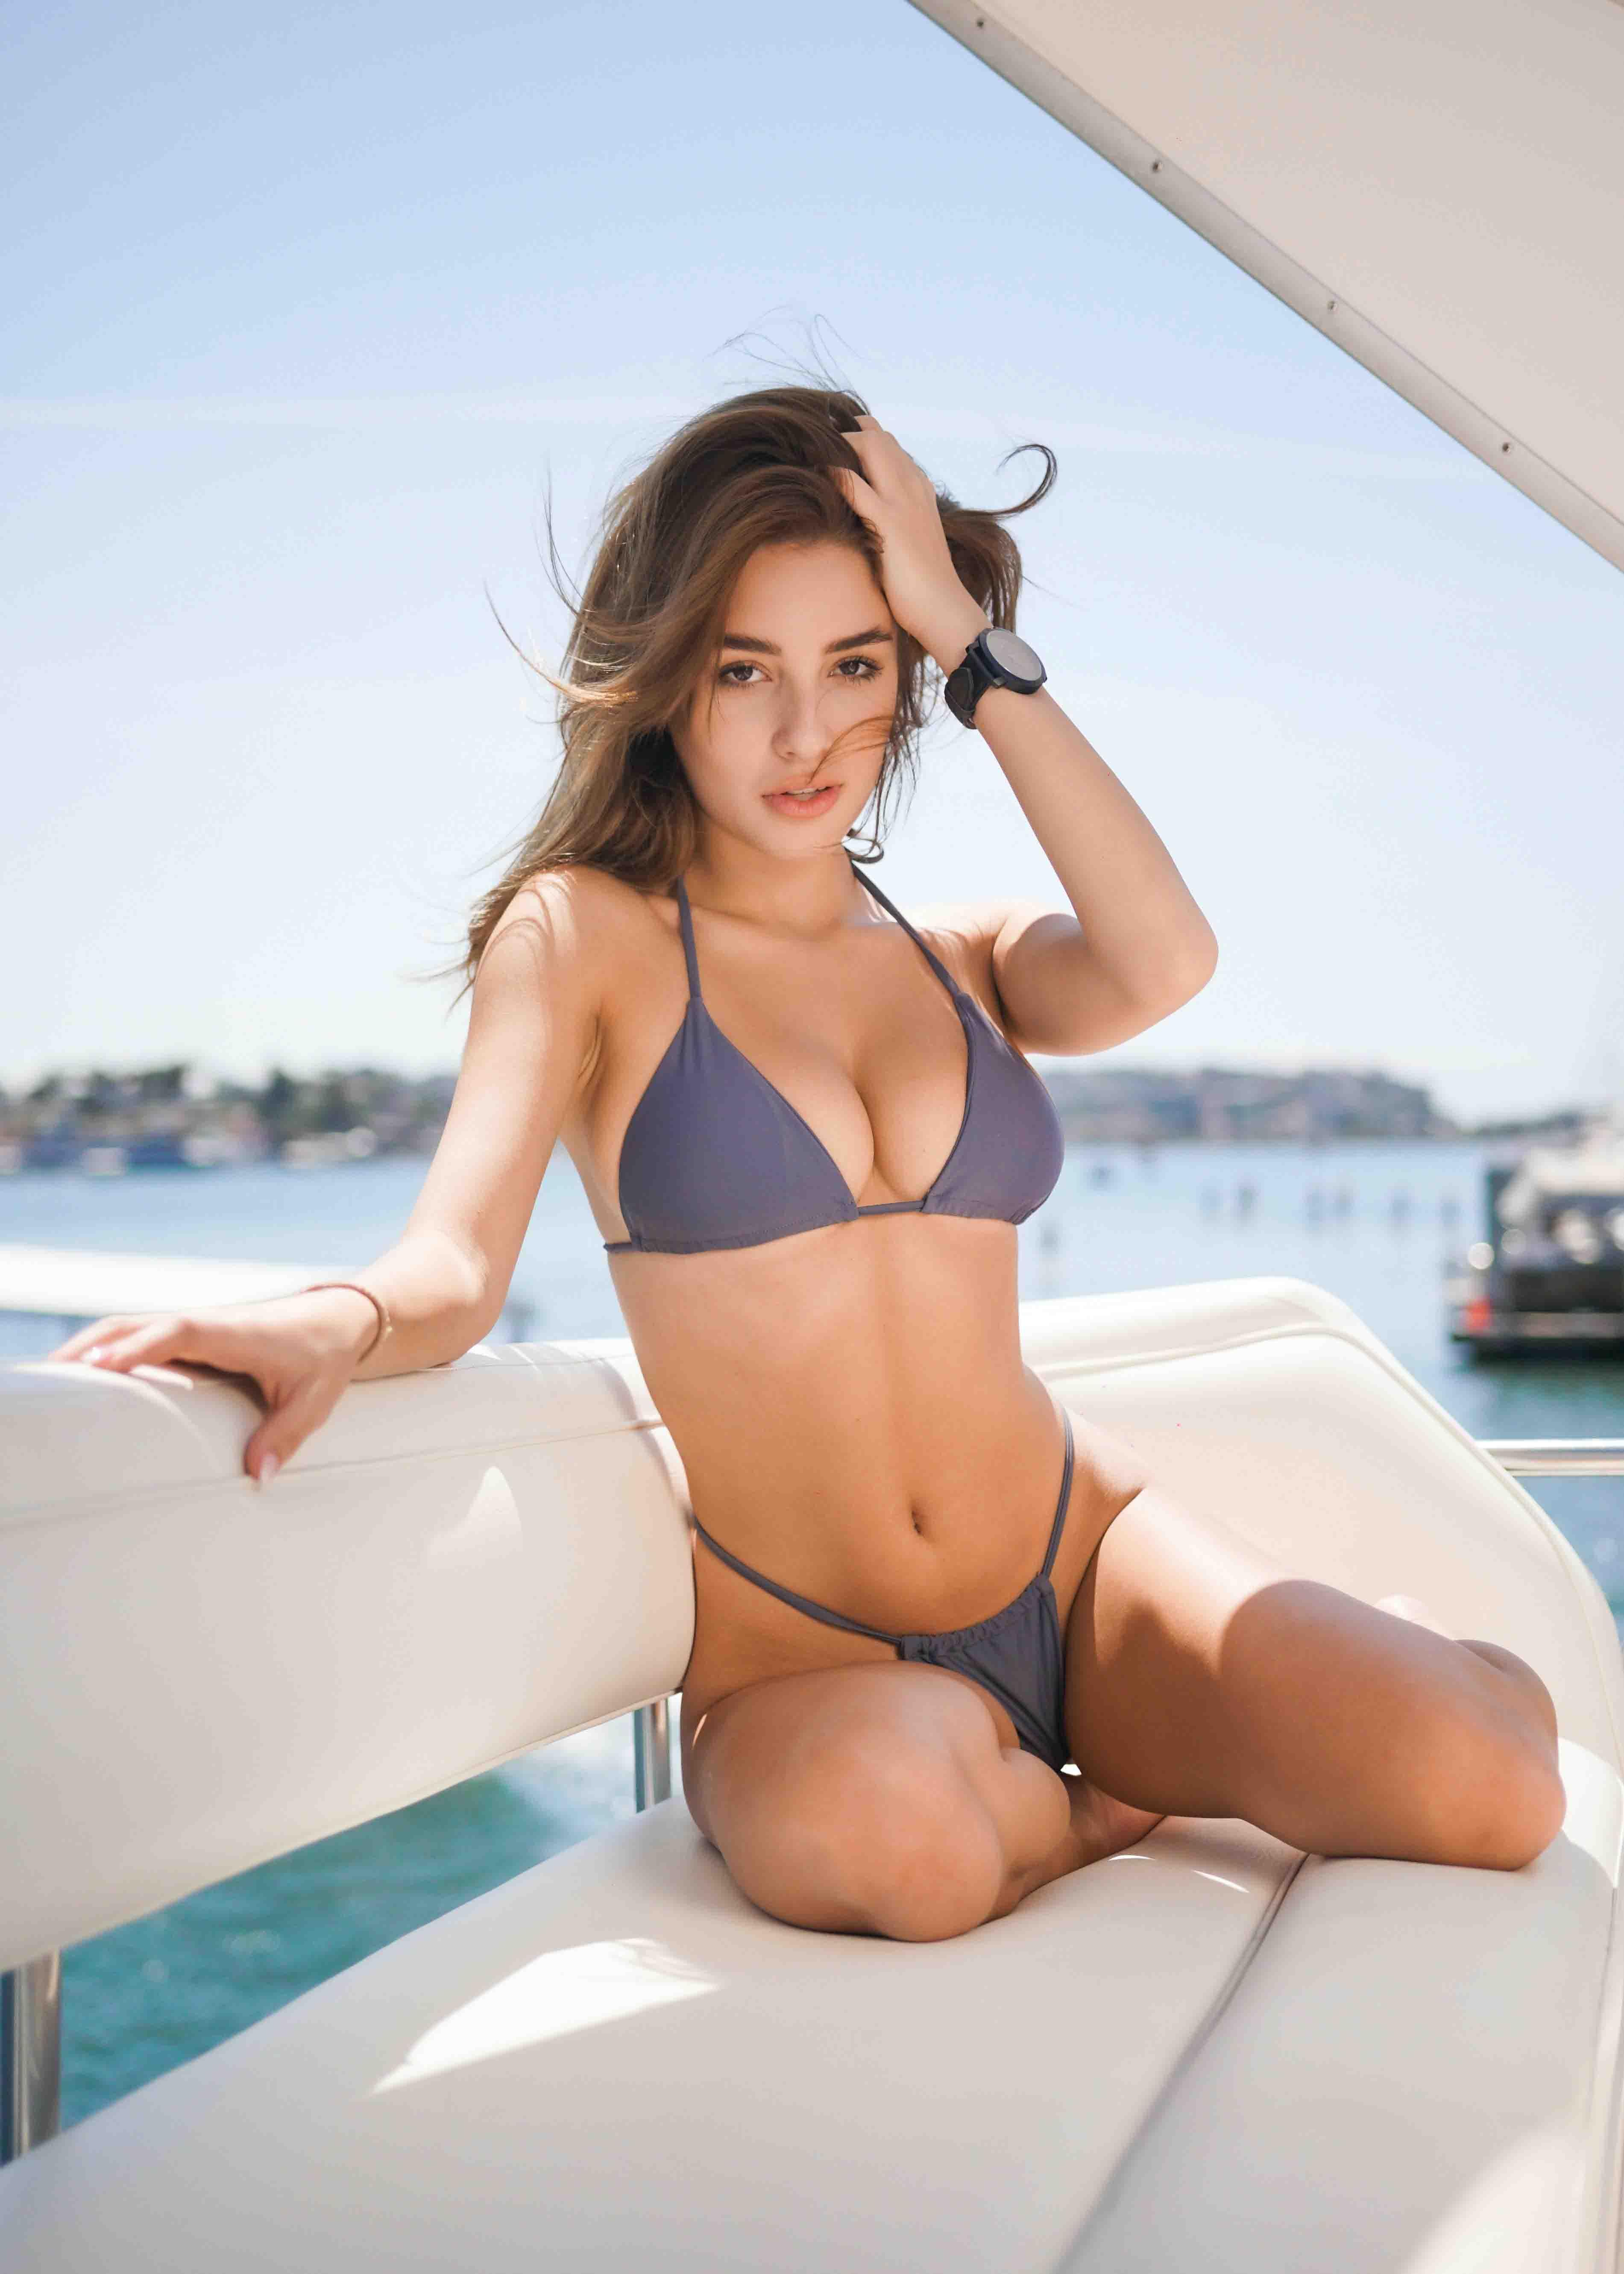 Brunette escorts - hot lady